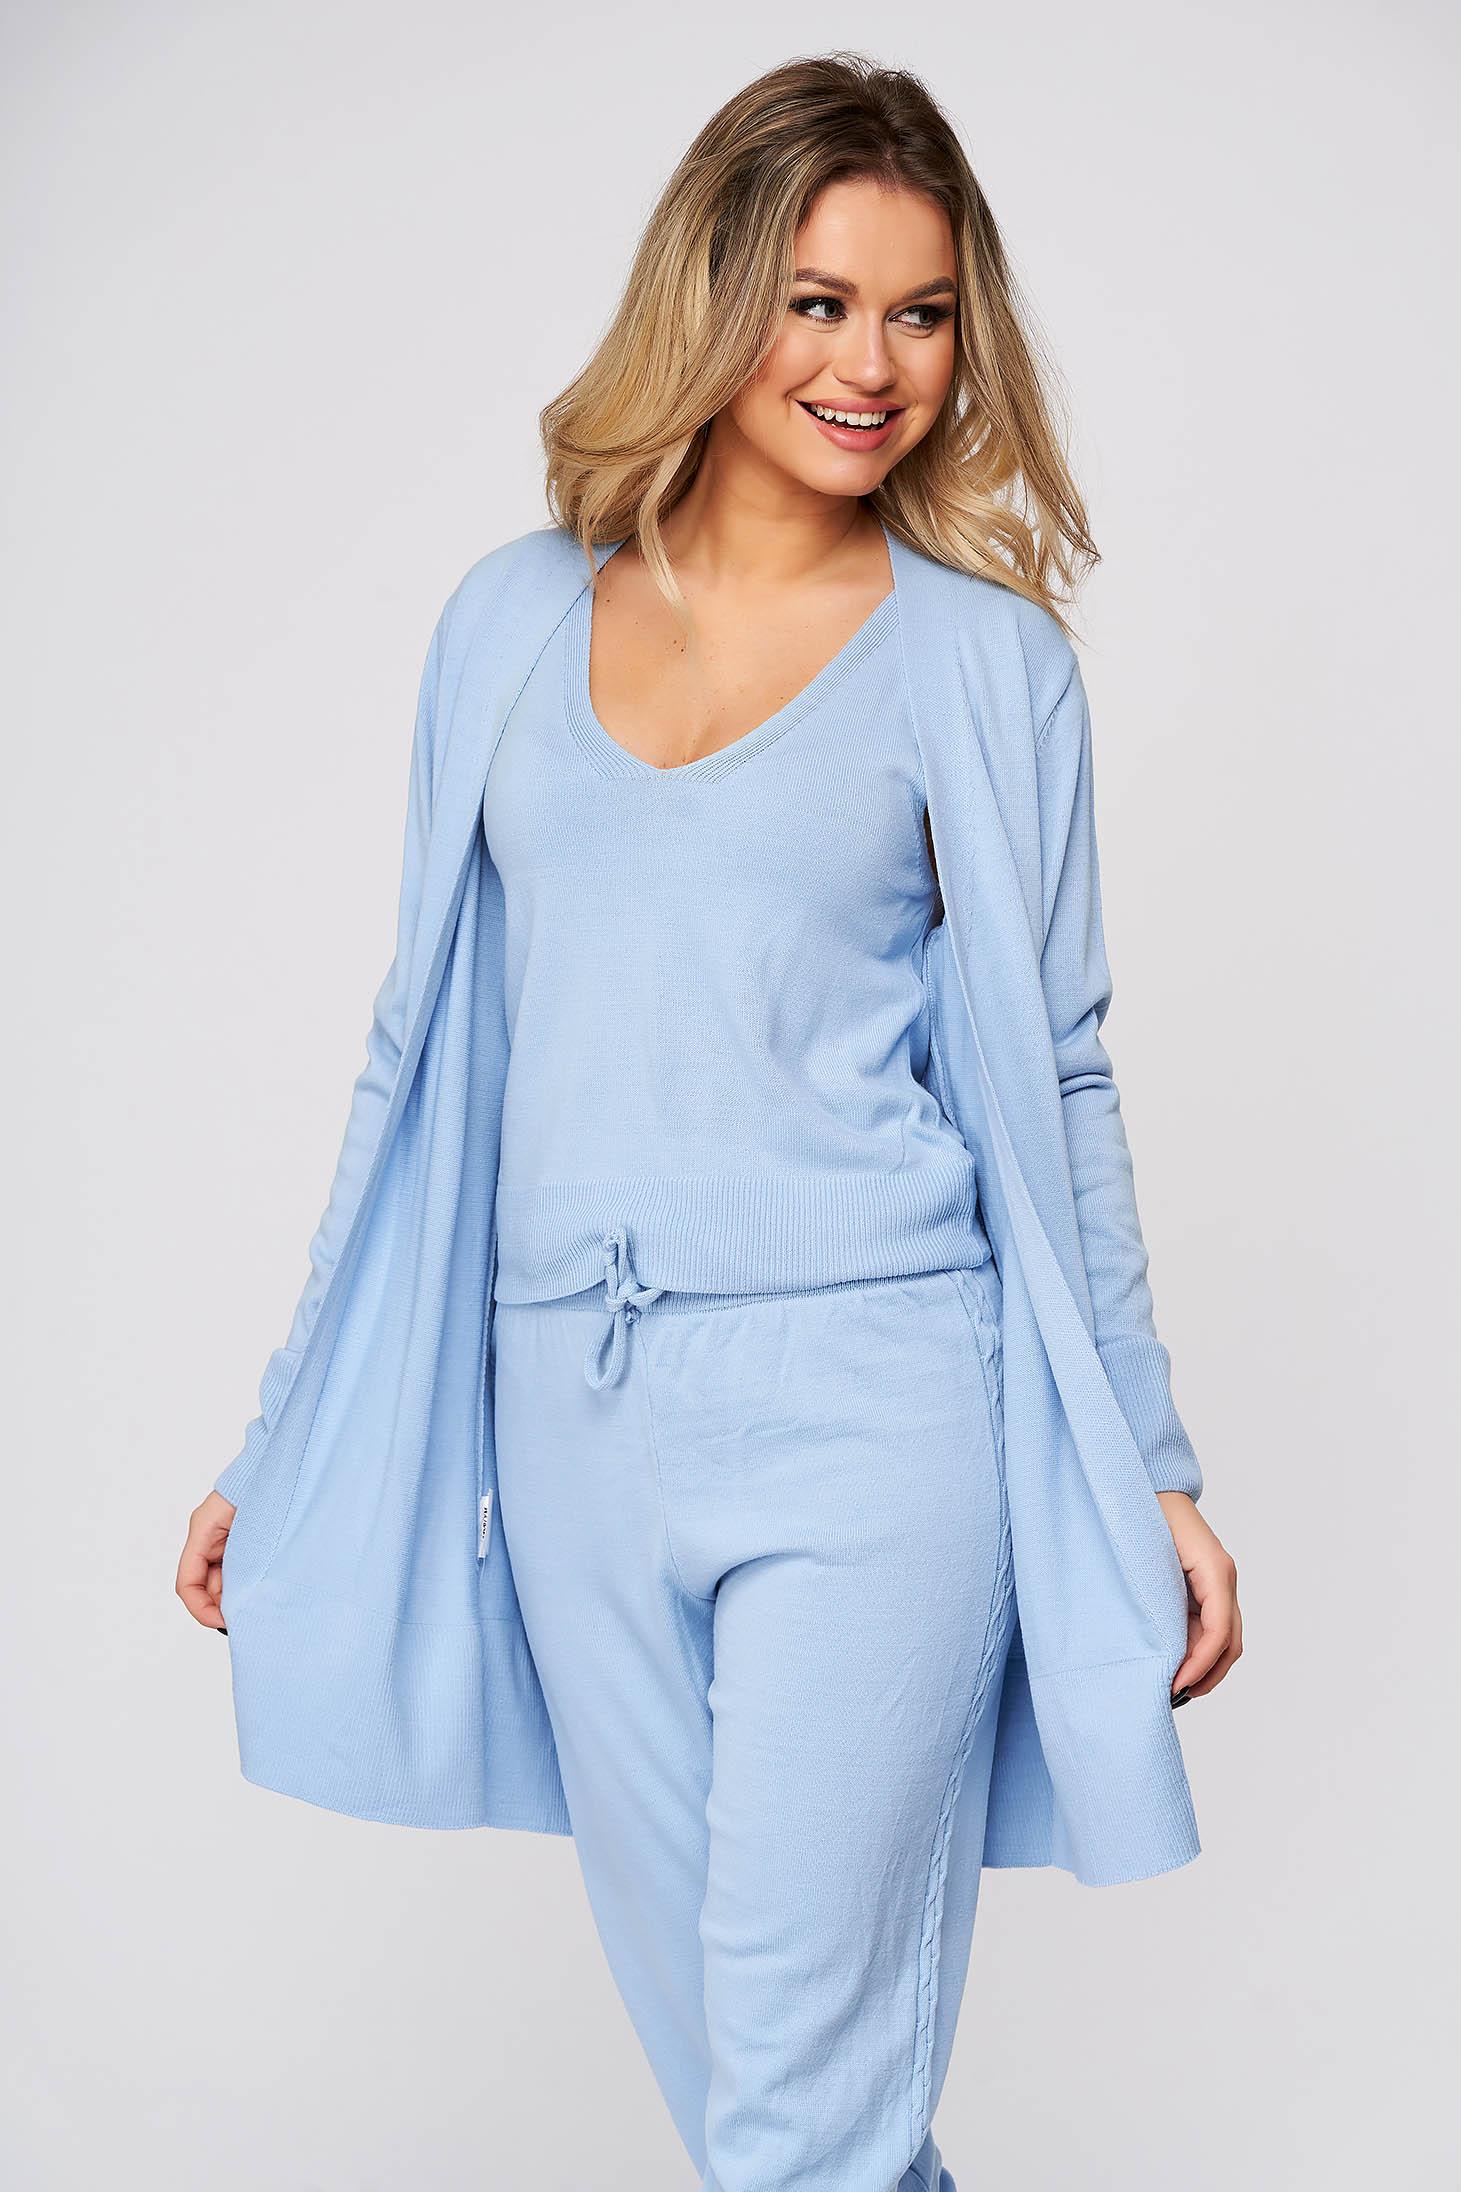 Trening dama SunShine albastru aqua casual din material tricotat cu cardigan